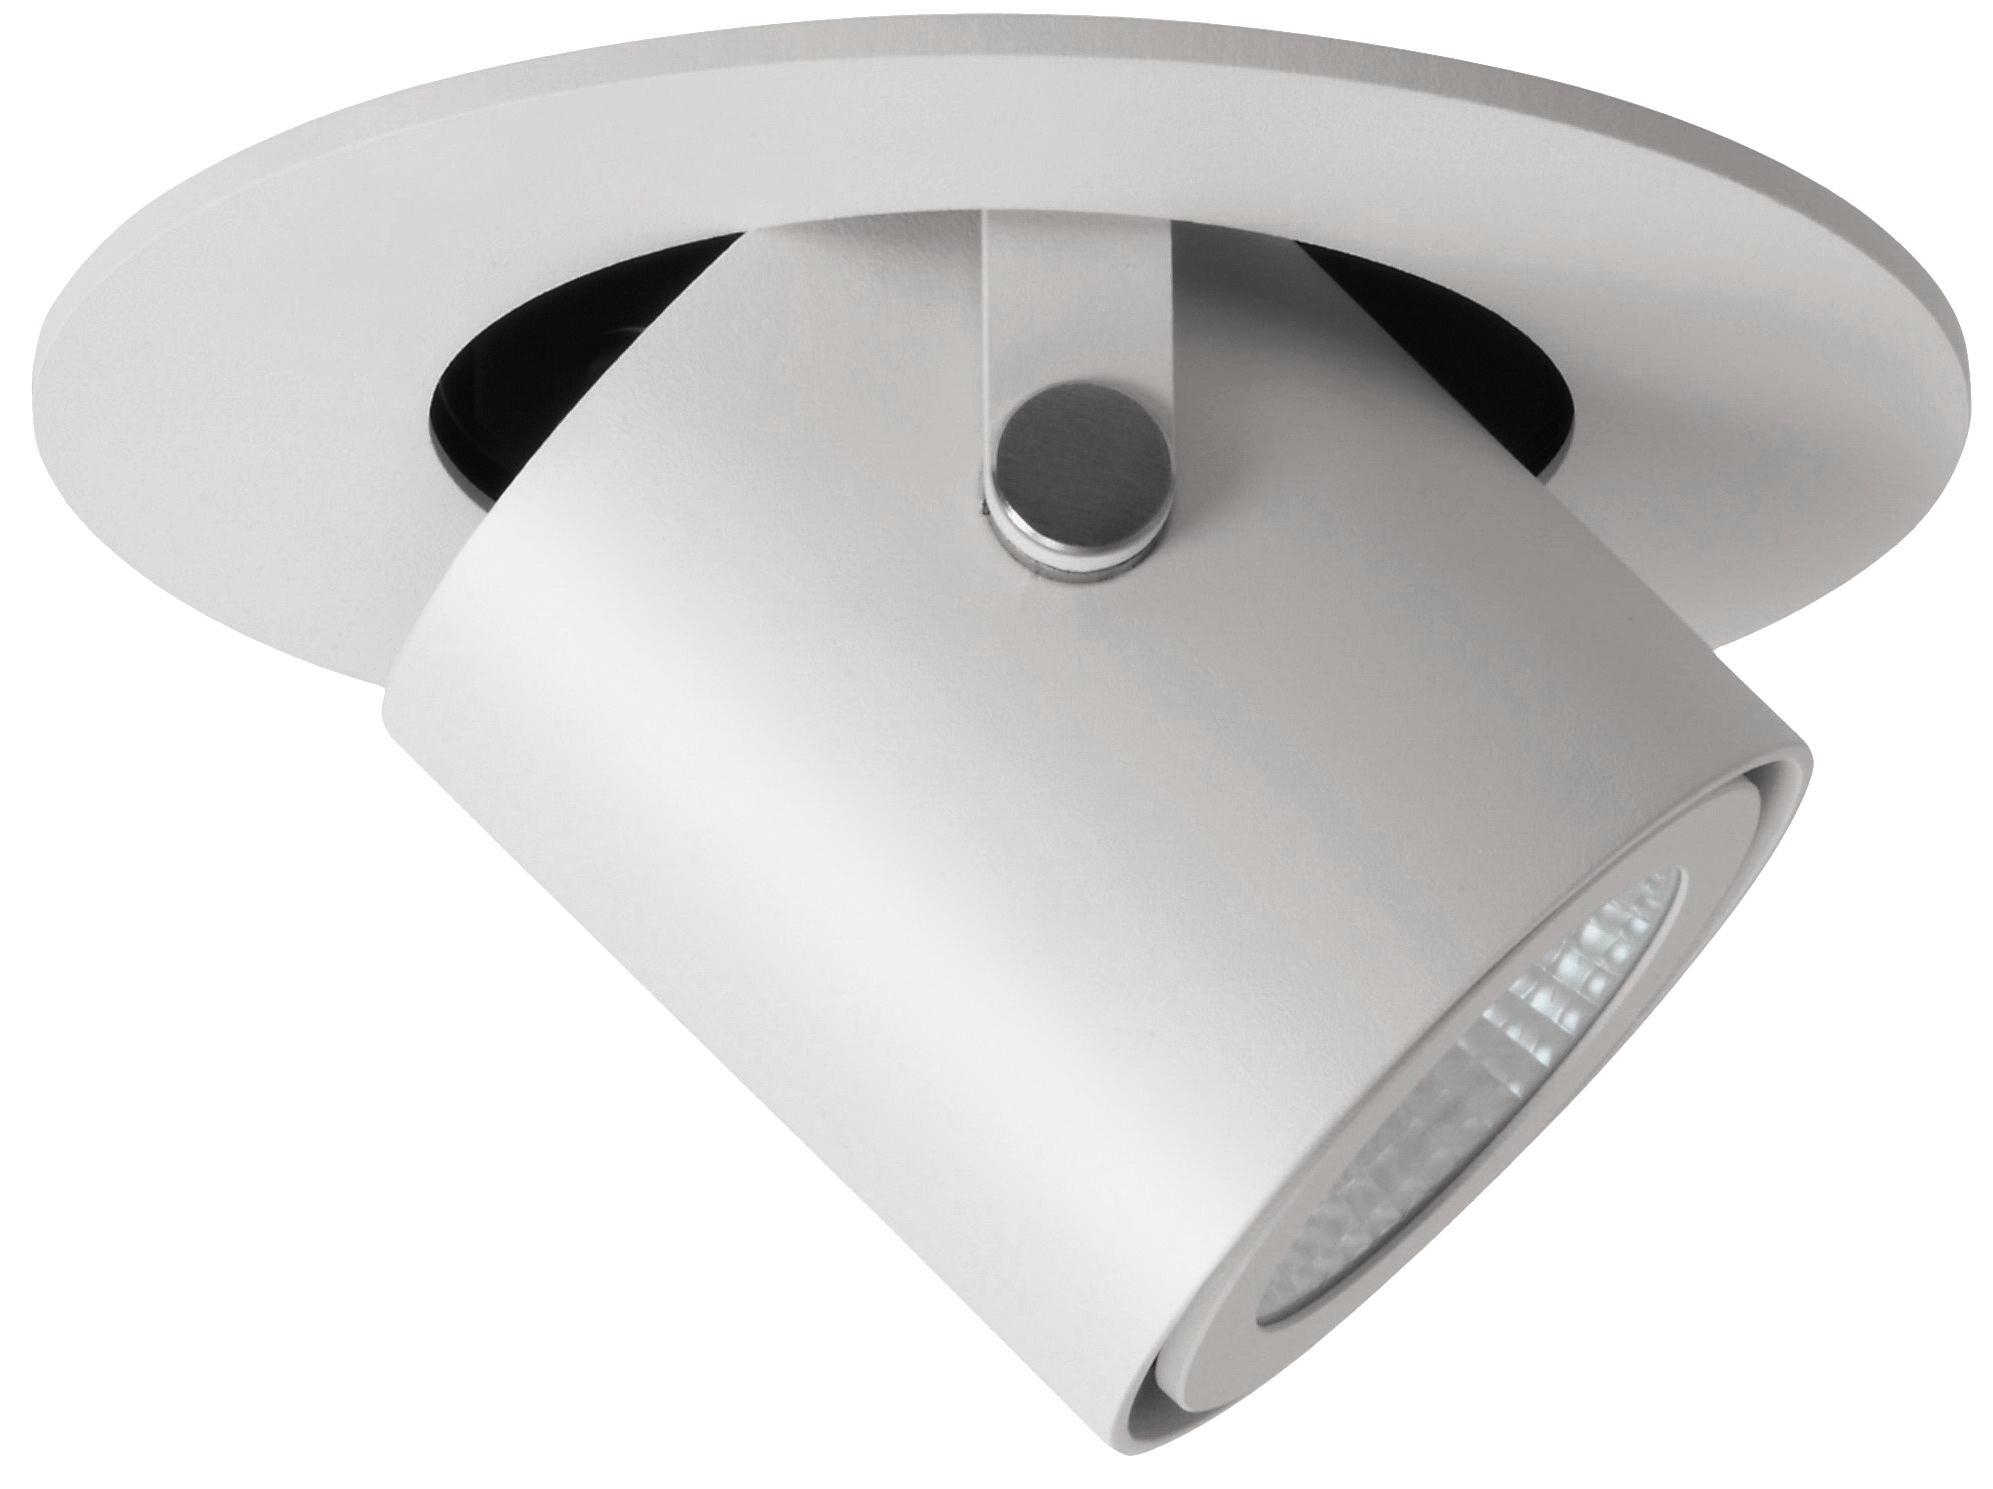 1 Stk Avator Motion LED Einbaudownlight 53W 4000K, 4300lm, RAL9003 LI99000573